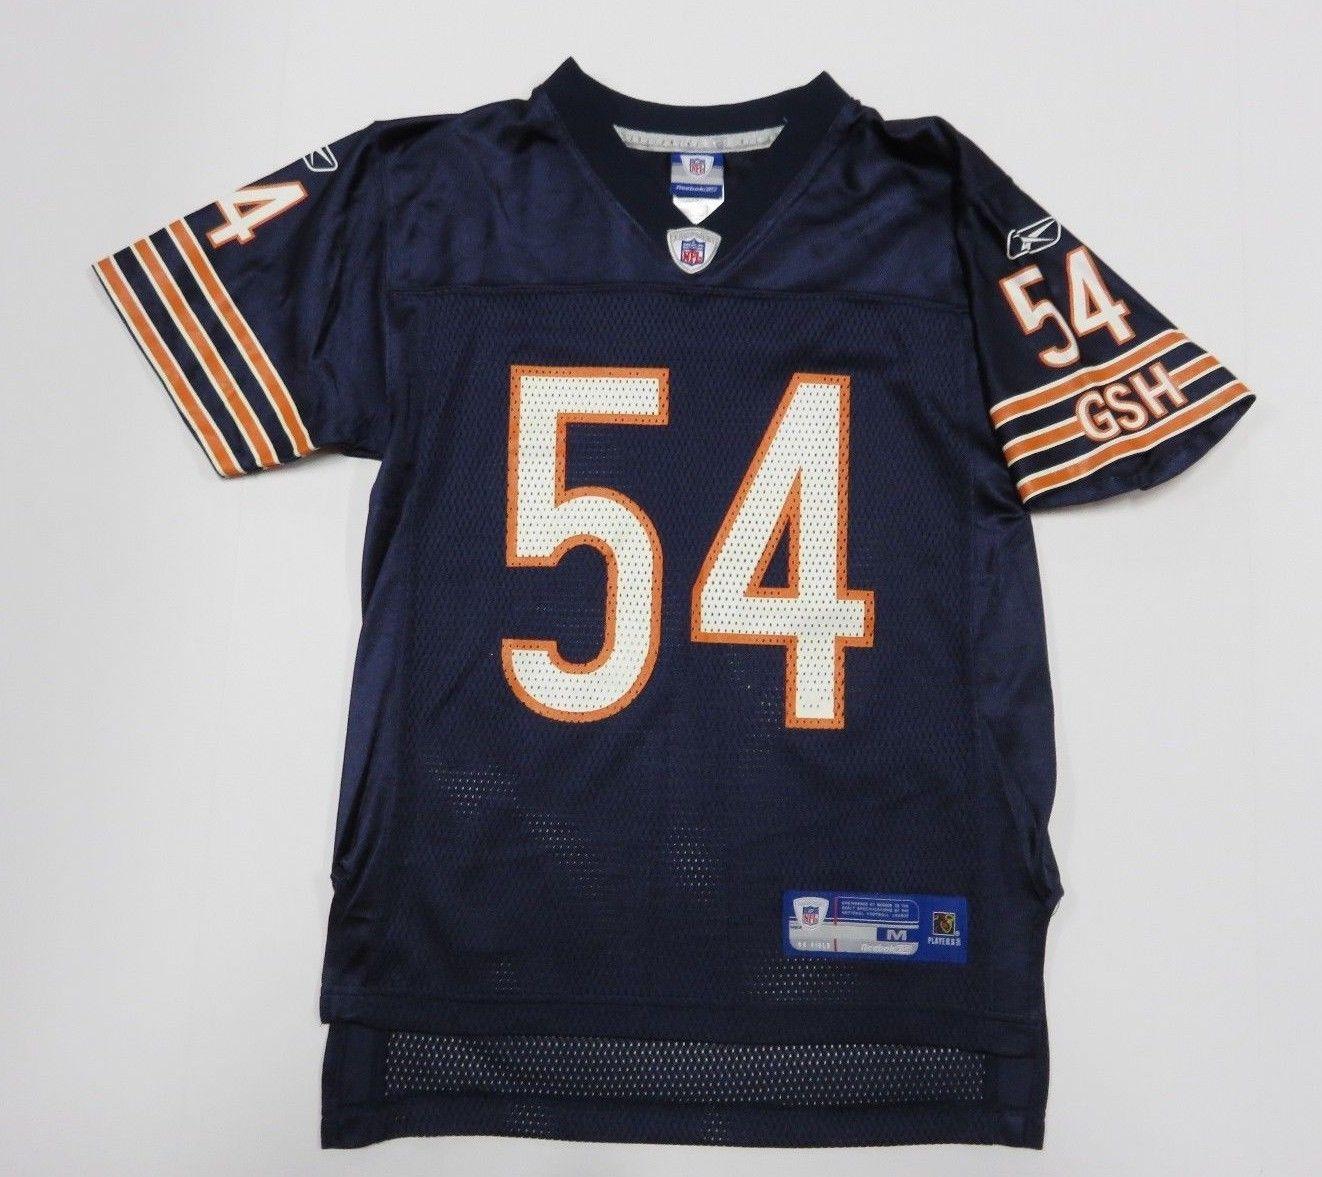 3c566b12448 NFL REEBOK Brian Urlacher #54 Chicago Bears and similar items